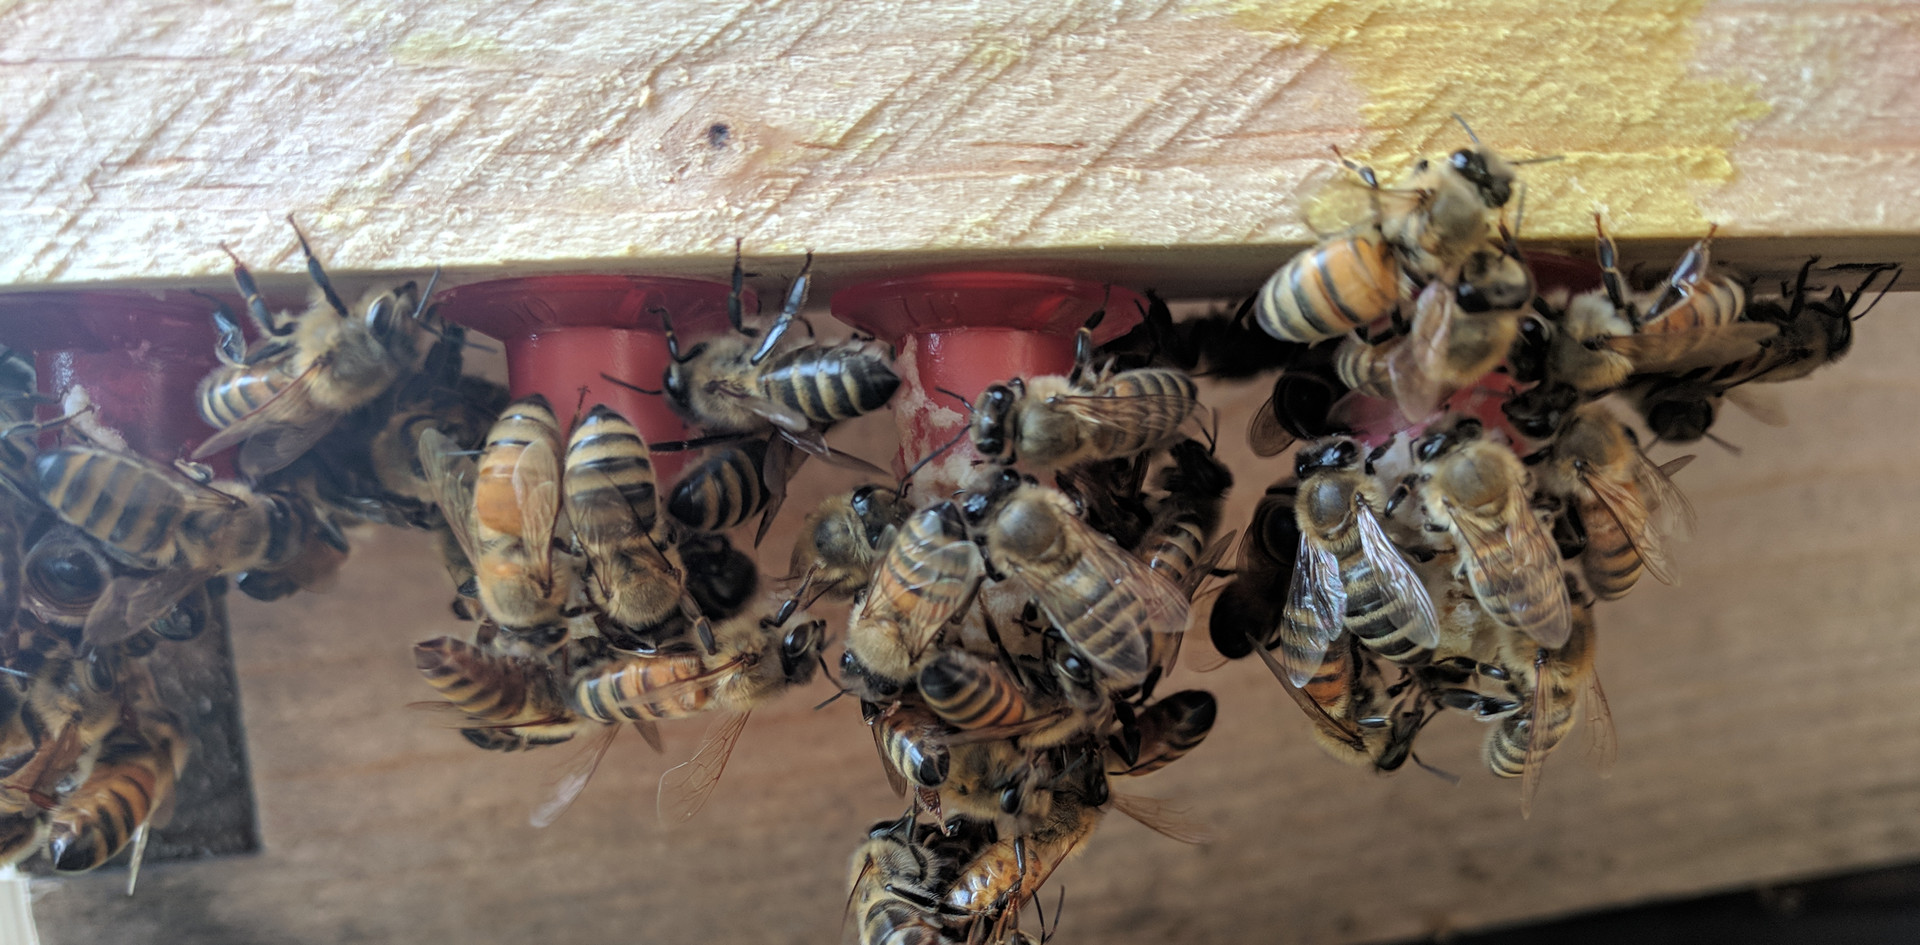 Nurse bees feeding royal jelly